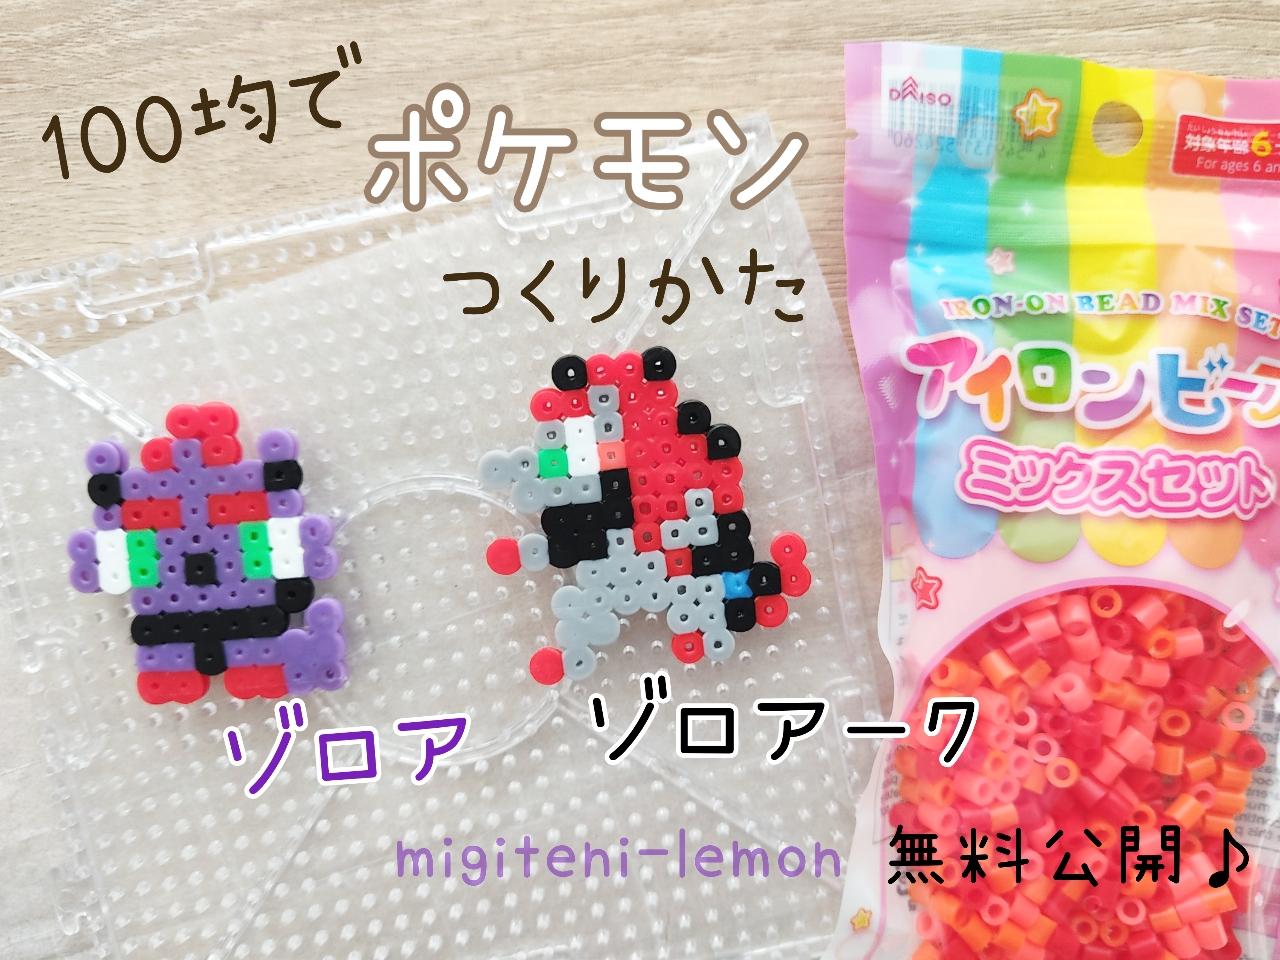 zoroa-zorua-zoroark-aku-pokemon-ironbeads-zuan-small